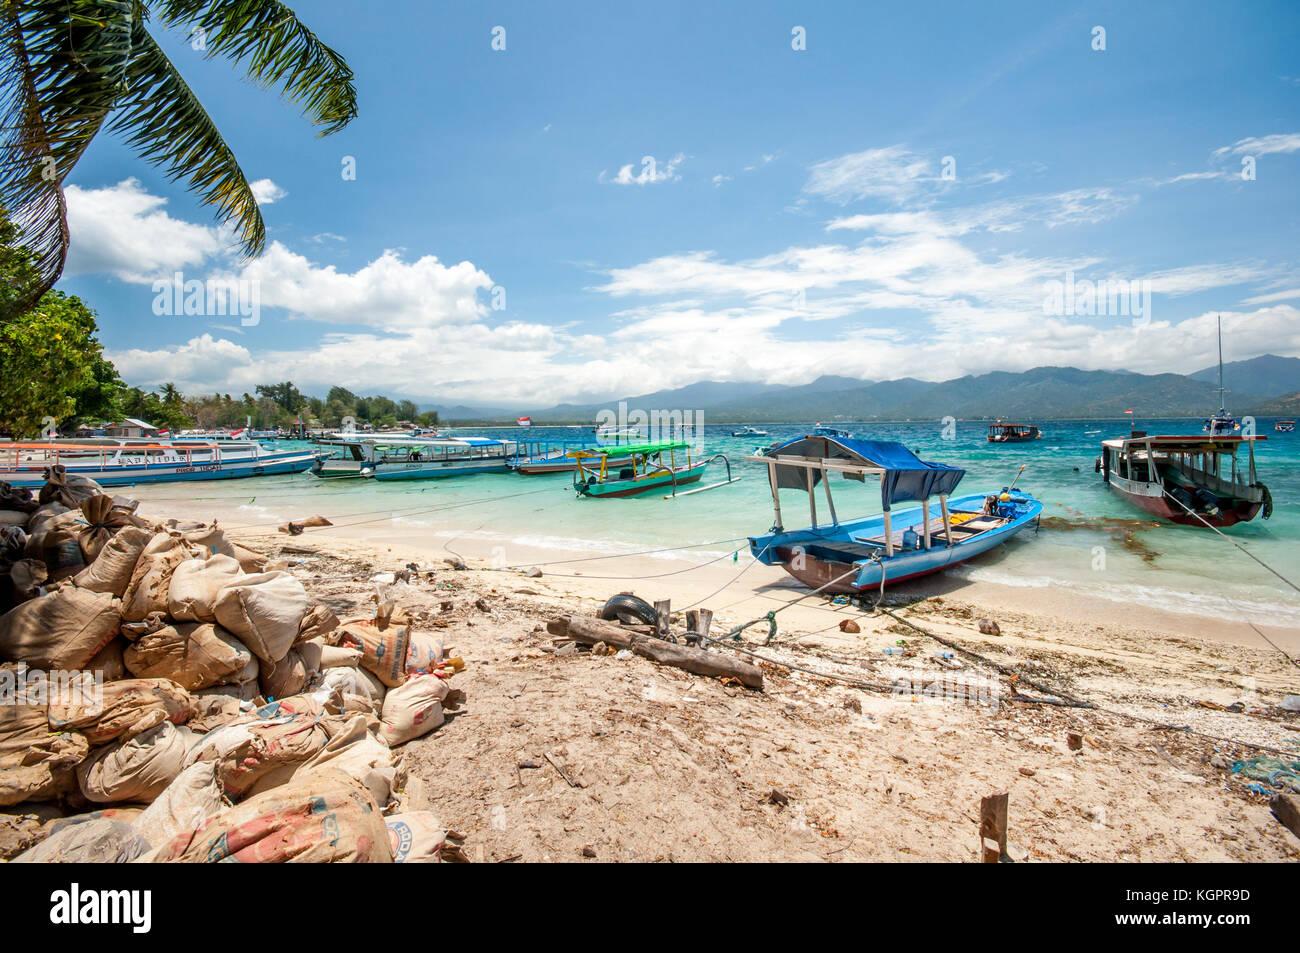 Gili Air Harbor, barcas tradicionales de Indonesia, Islas Gili, Indonesia, Sudeste Asiático, Asia Imagen De Stock